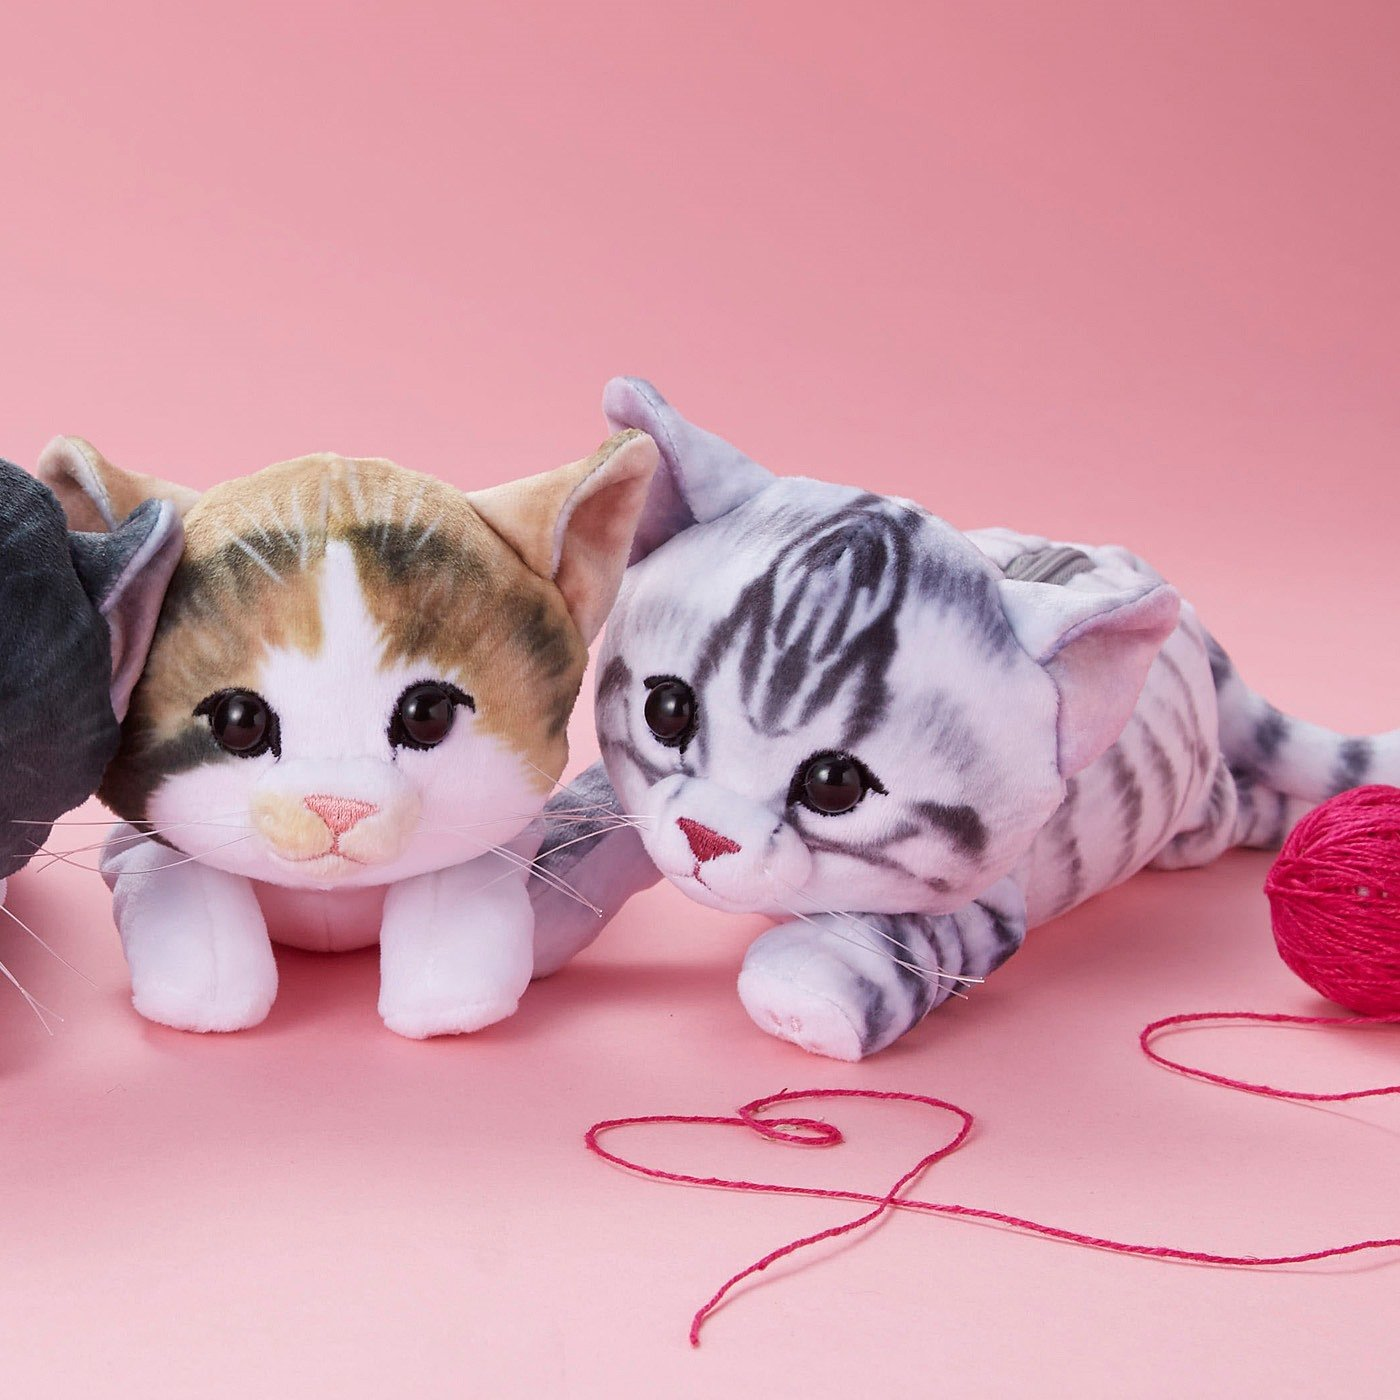 YOU+MORE! 夢のもちふわ触感 もっちり子猫ポーチの会